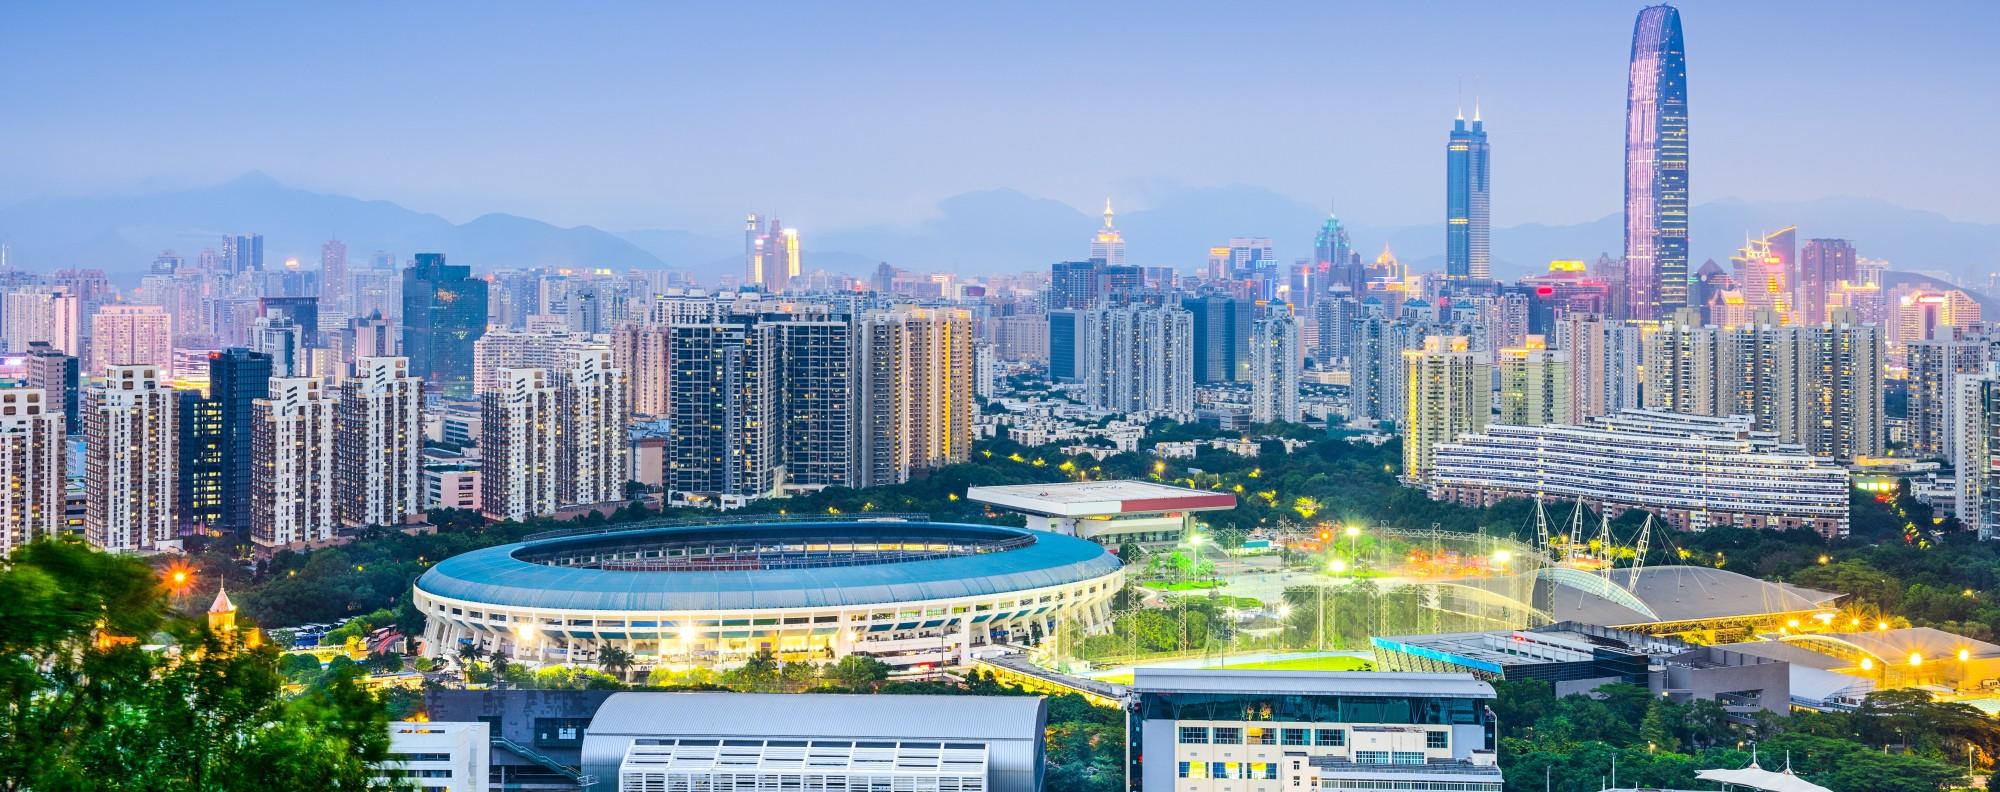 Shenzhen, China's Silicon Valley. File photo